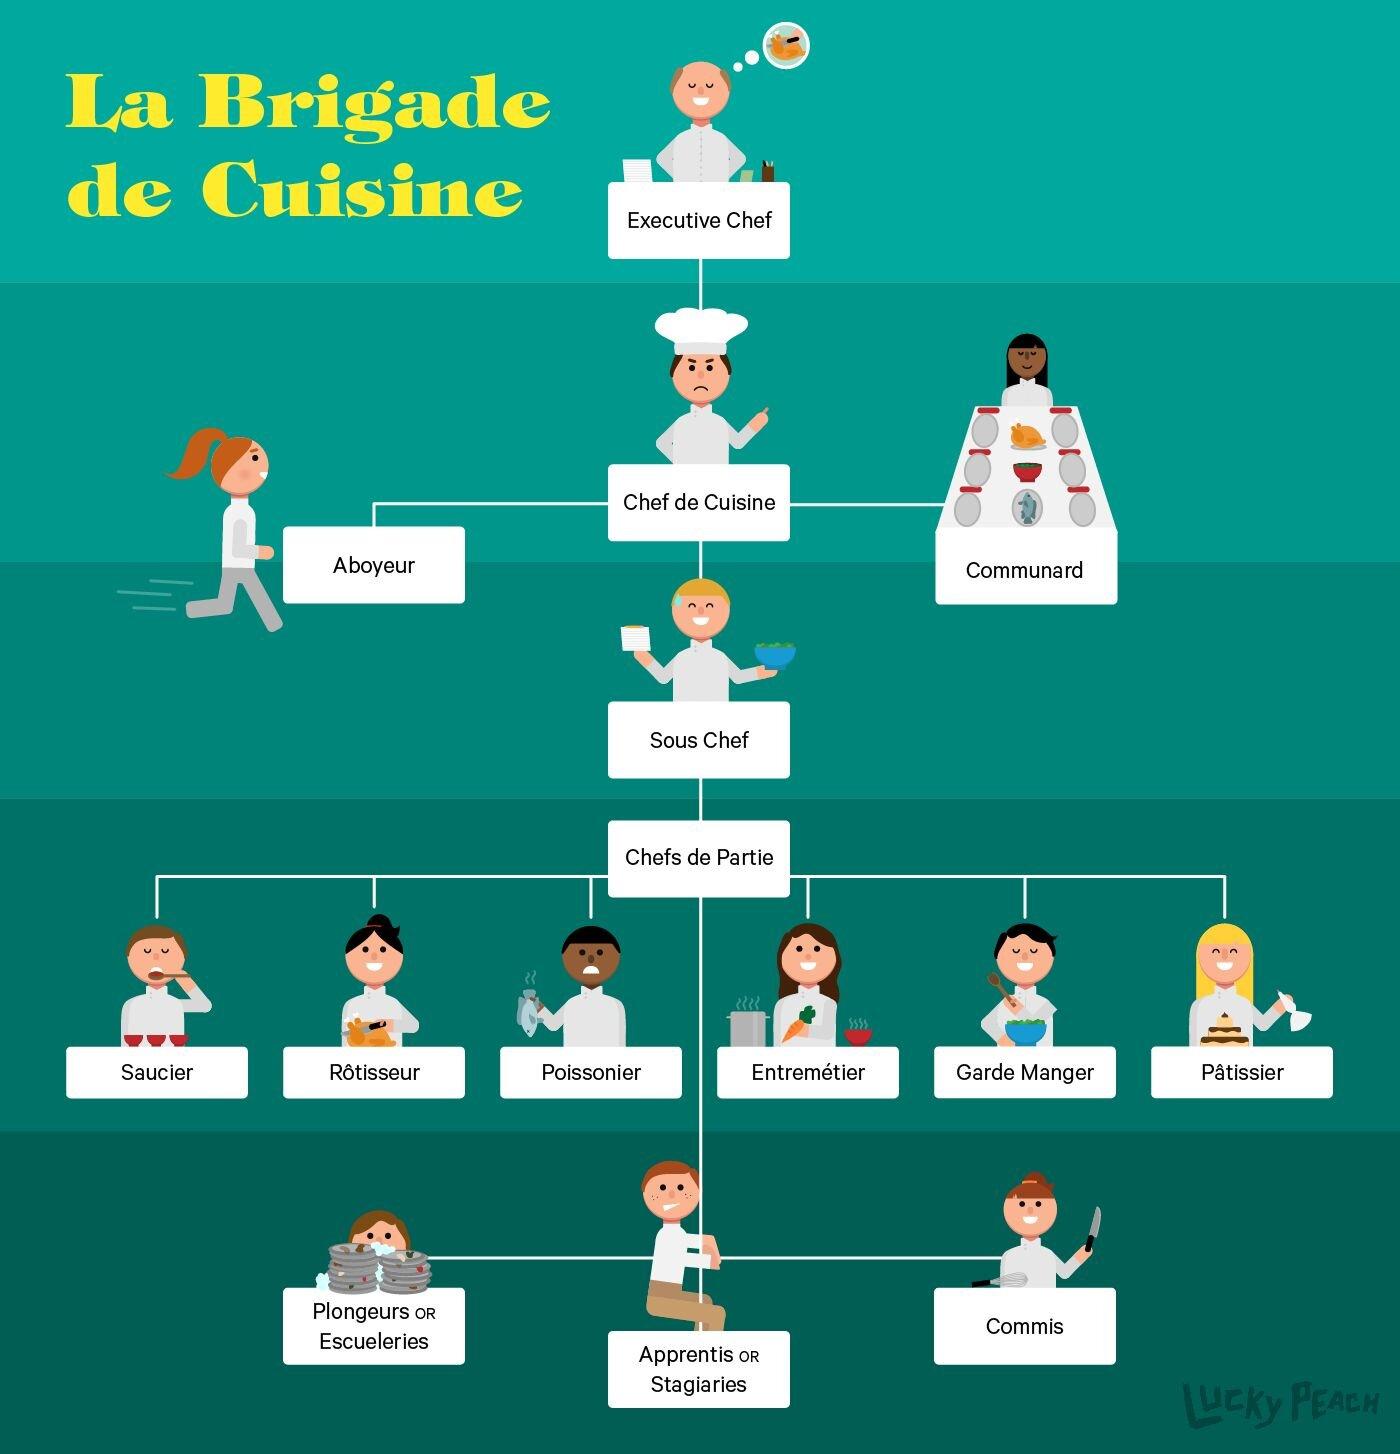 「La brigade de cuisine」廚房體制圖。本圖中在「chef de cuisine」(廚房主廚)之上還有一個「Executive Chef」(行政主廚,法文為「chef exécutif」),將廚房的日常營運與管理工作職責分開,是假設在極大的集團中出現的情形。此時行政主廚可能會需要管理好幾個廚房、而每個廚房都有一個實際領導日常事務的主廚。  一般在高級飯店中,較常見的情形會是由「sous-chef」(副主廚)擔任圖中「chef de cuisine」(廚房主廚)的工作,而「chef cuisinier」(主廚)負責圖中「Executive Chef」(行政主廚)的職責。  (圖片來源:Carolyn Bahar for Lucky Peach)